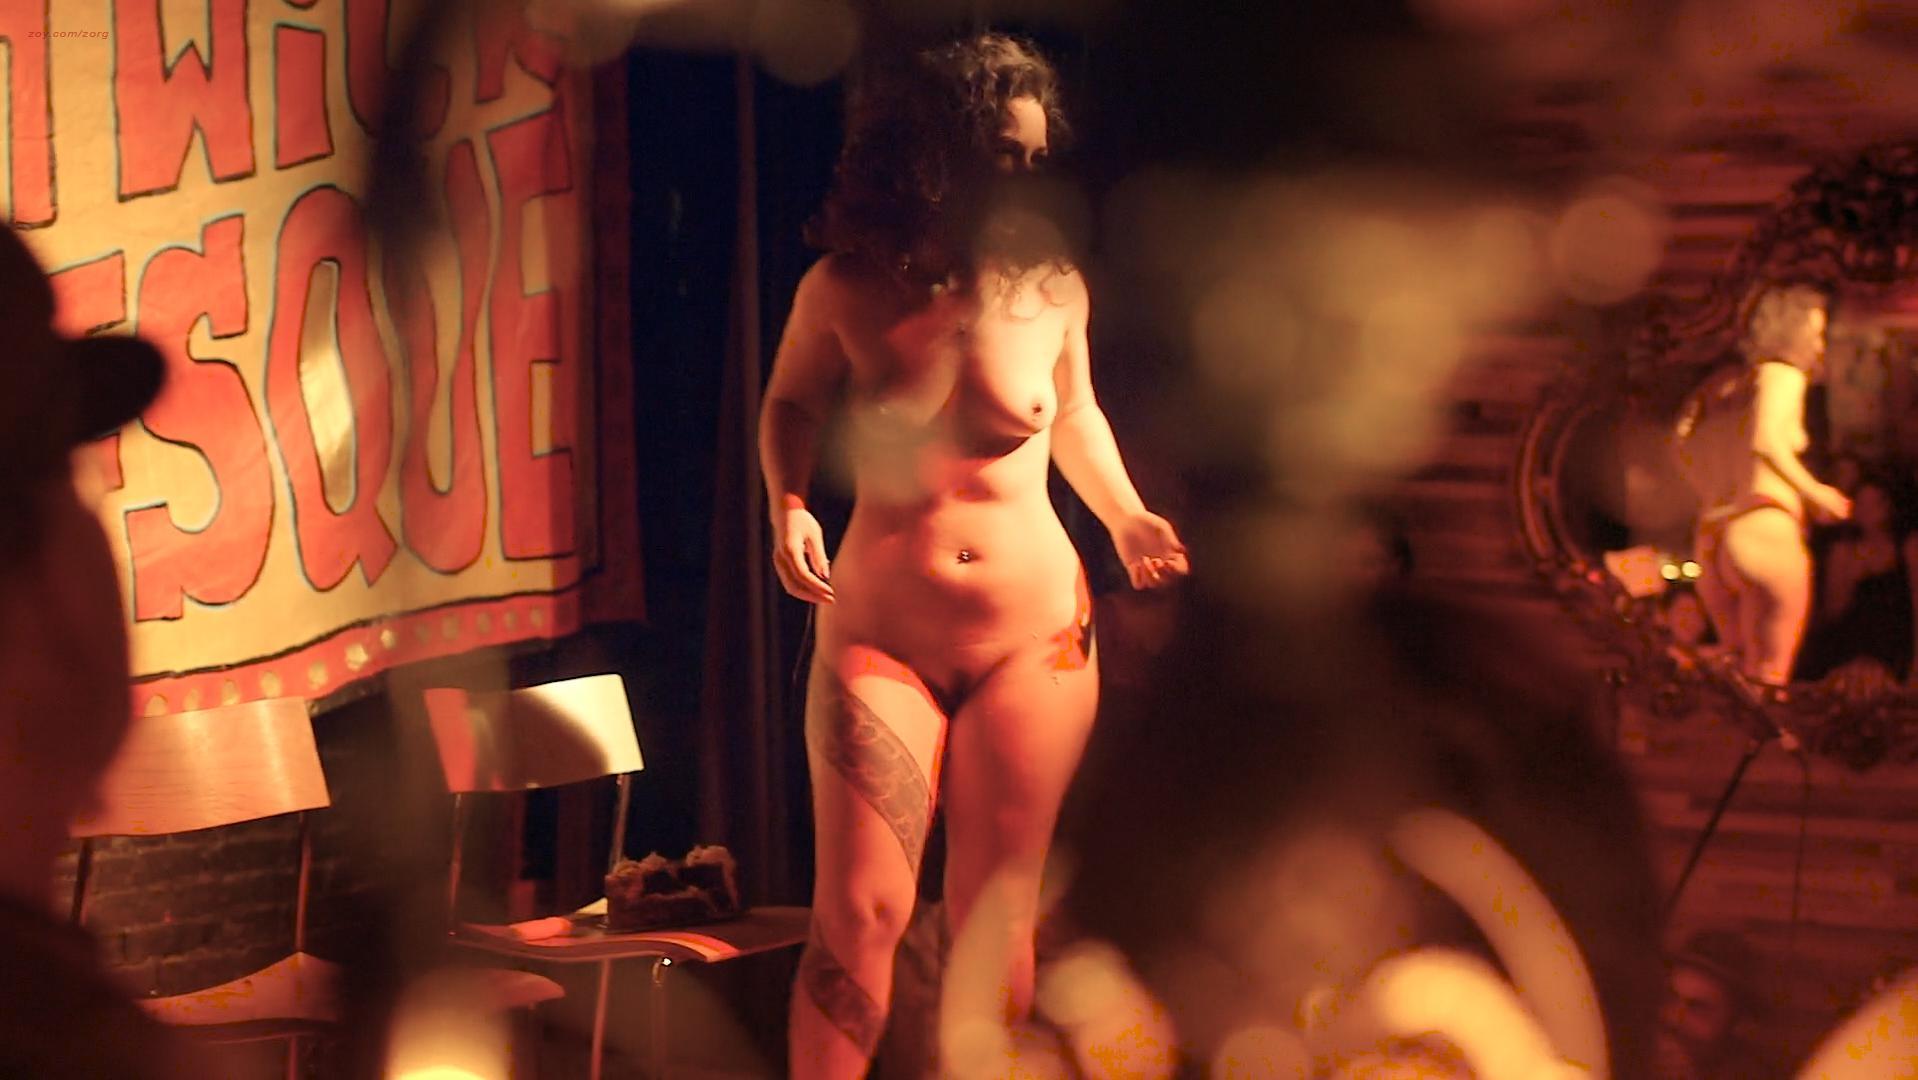 Rebekah Underhill nude, Raquel Nave nude - Brooklyn Bizarre (2015)